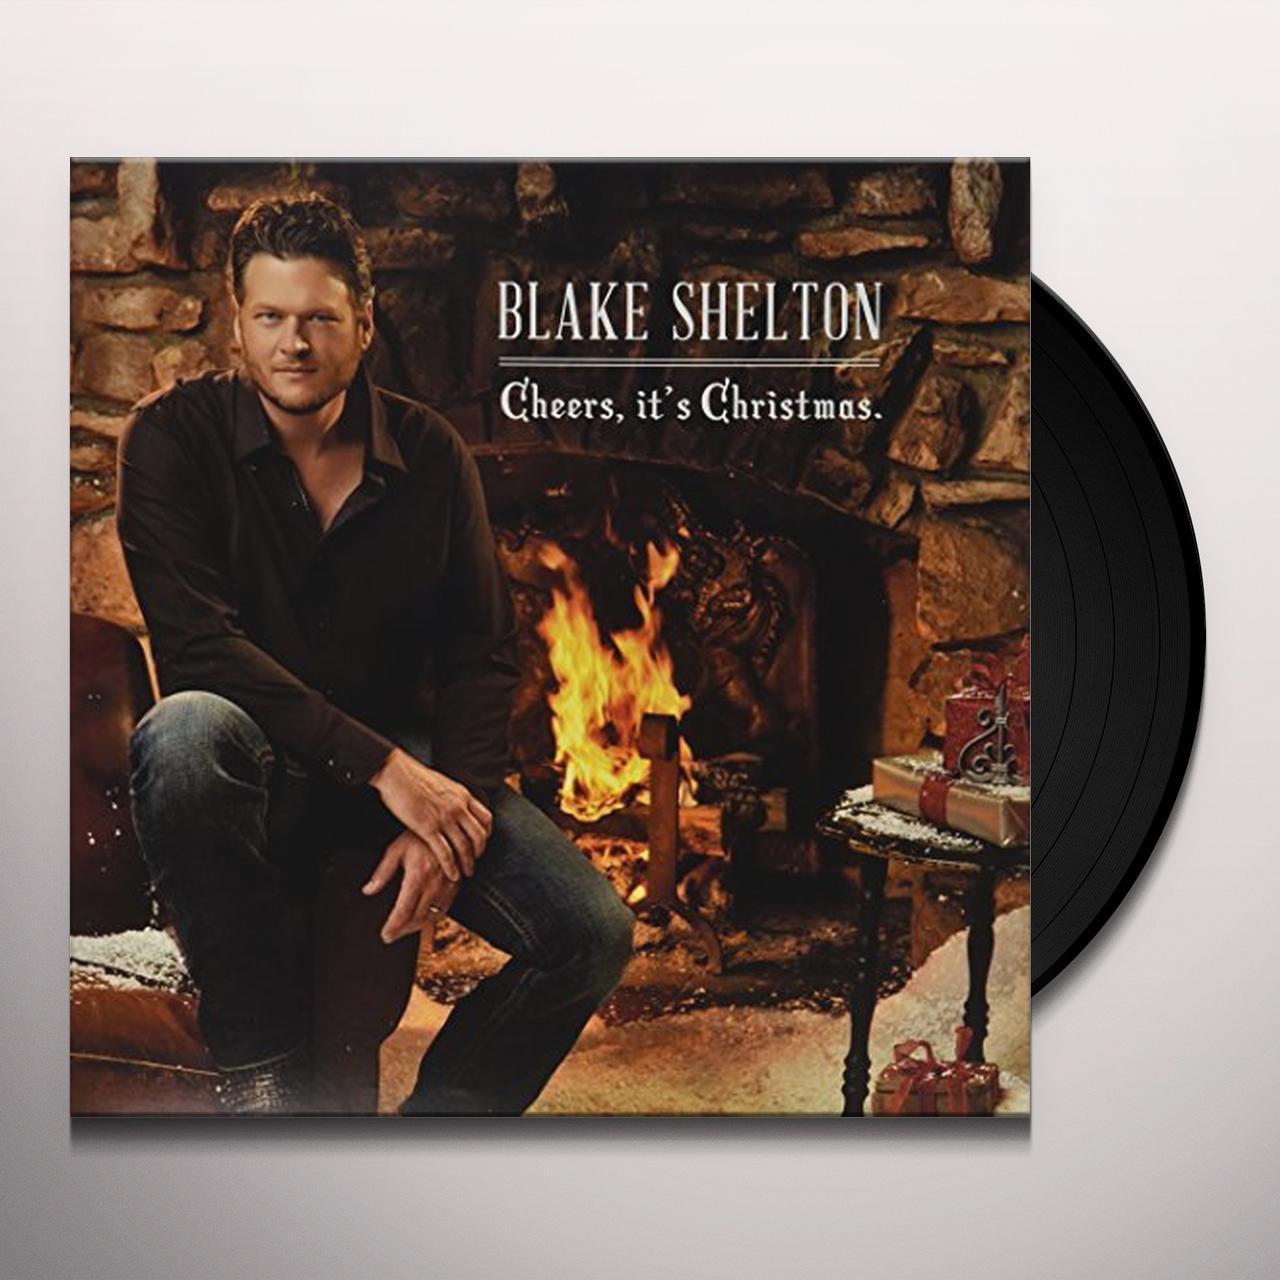 blake shelton cheers its christmas vinyl record - Blake Shelton Christmas